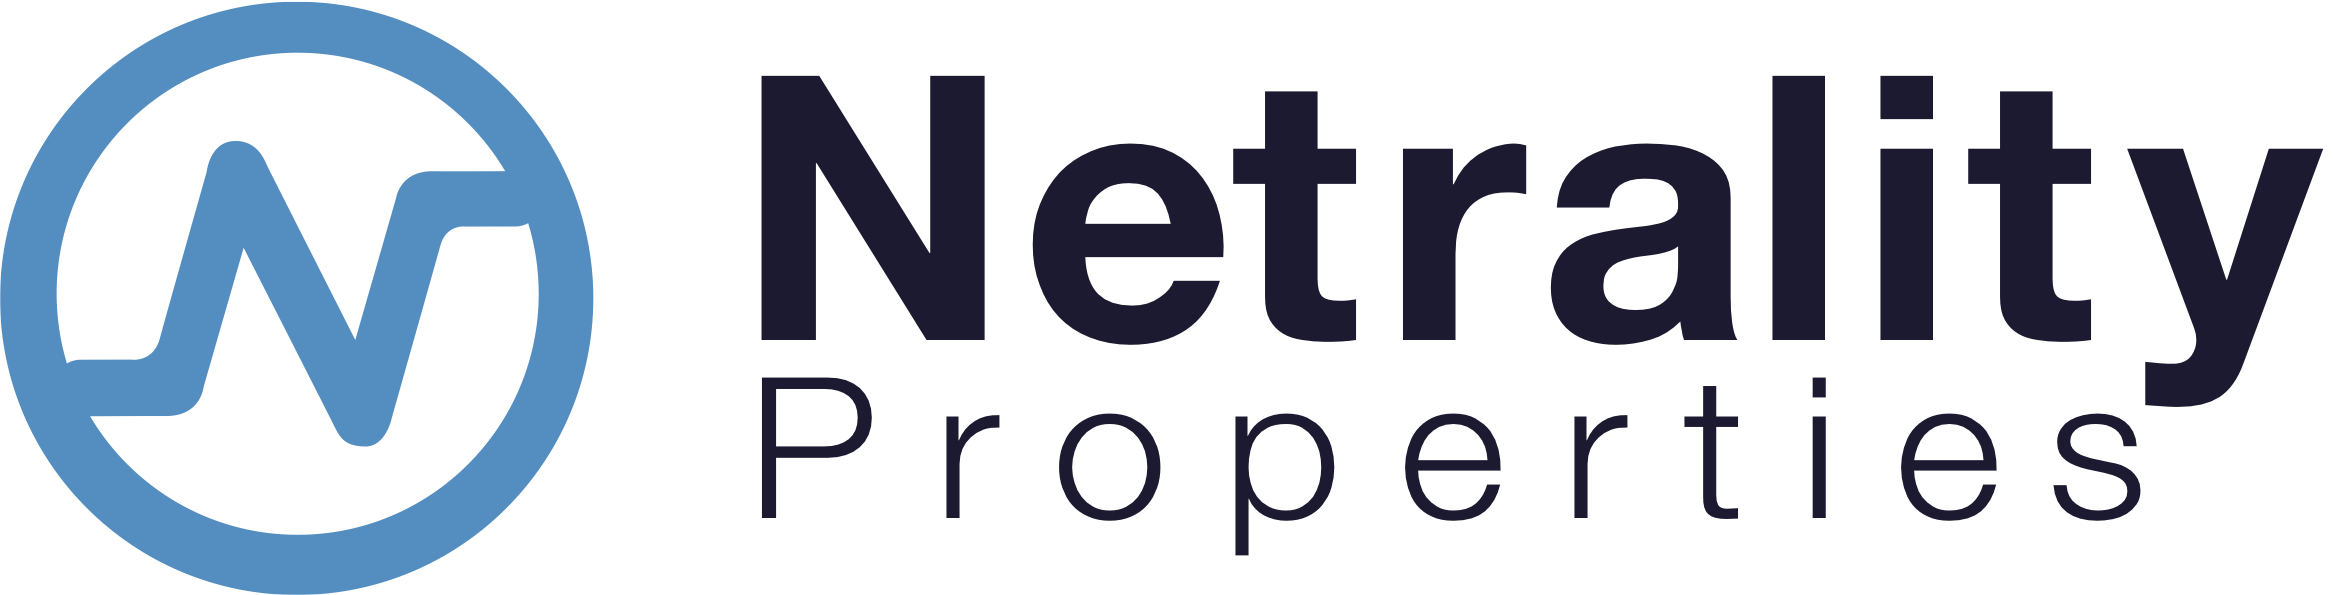 Provider Name Image